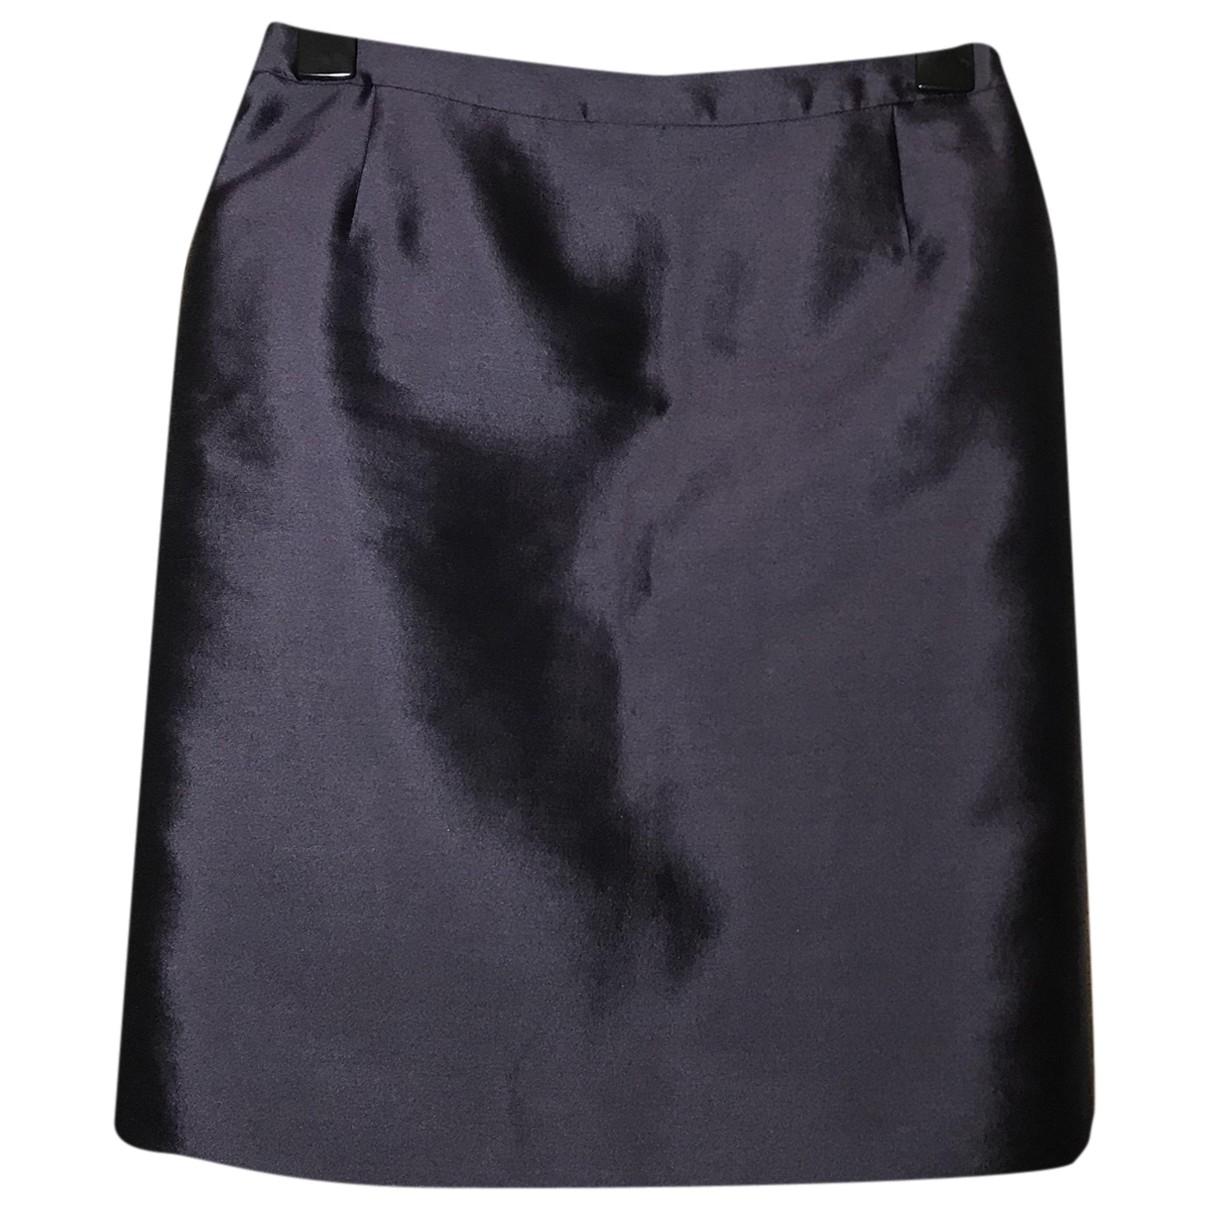 Rena Lange \N Wool skirt for Women 38 FR